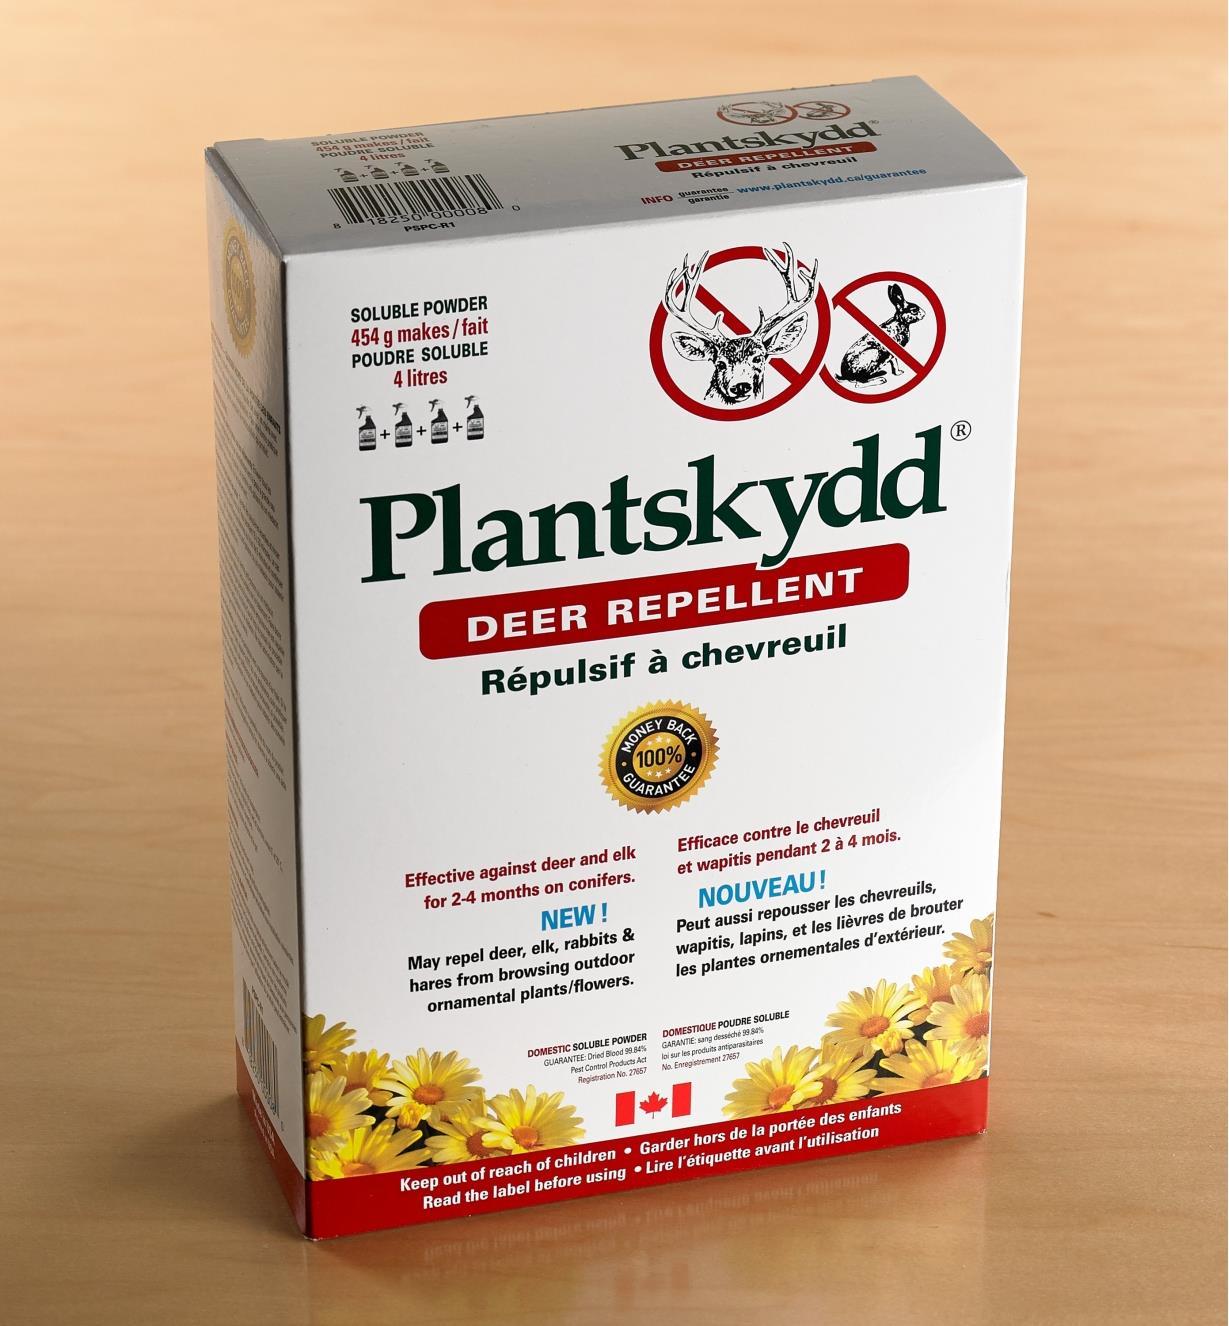 AG146 - Répulsif à herbivores Plantskydd, 1 lb (454 g)